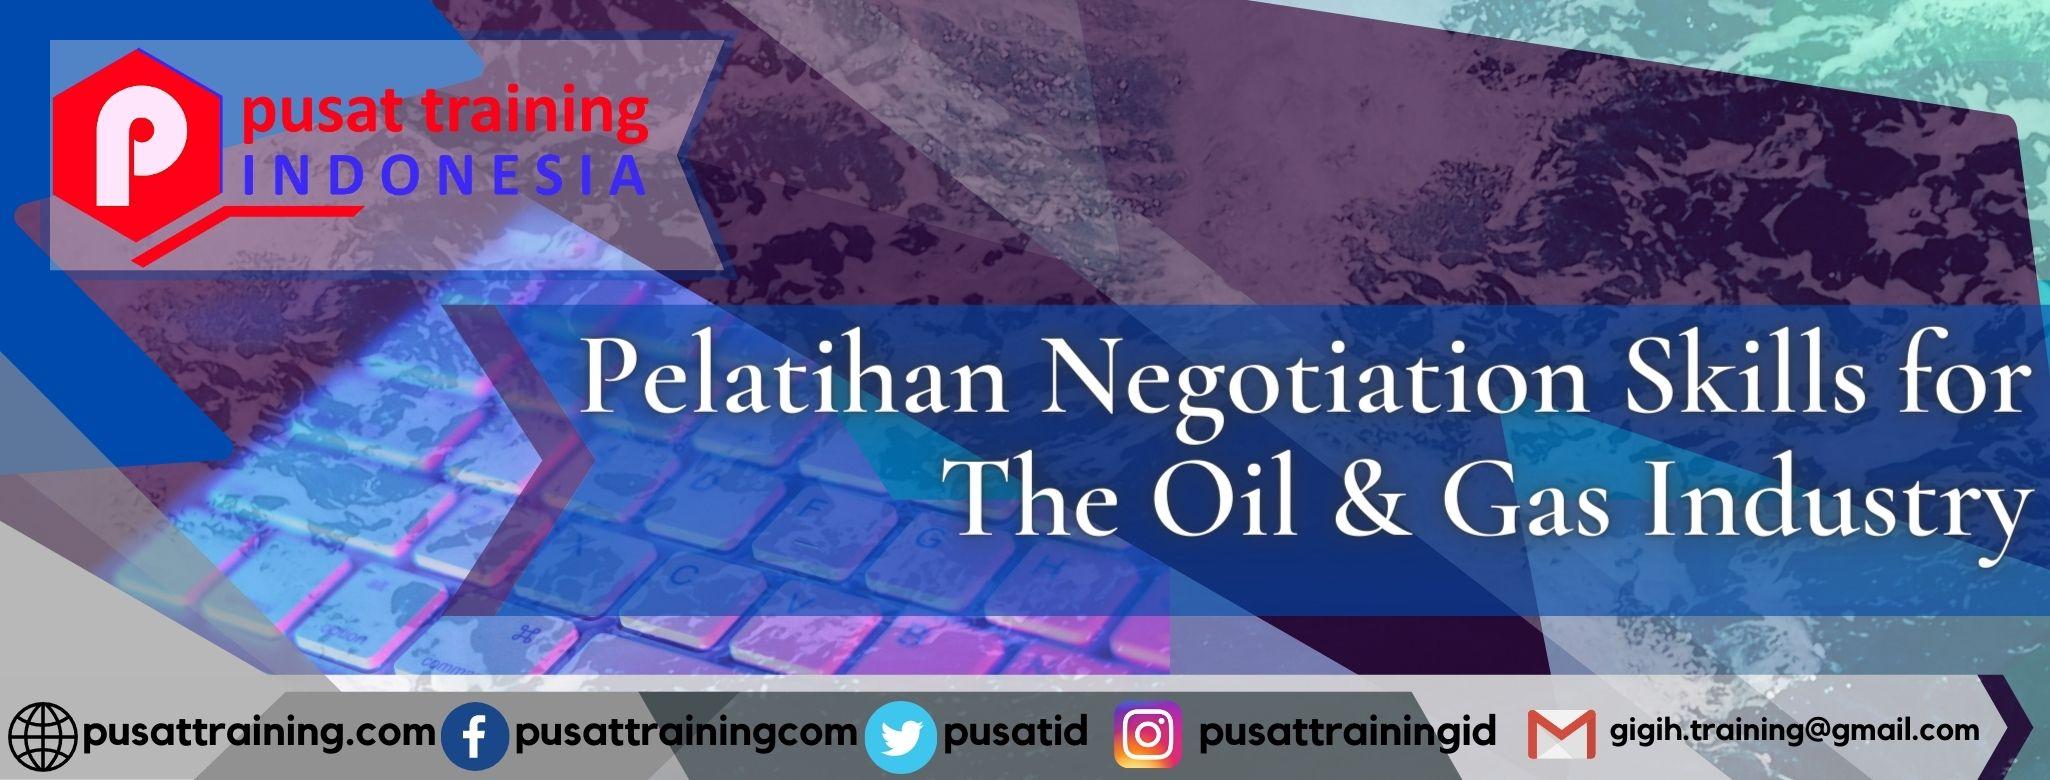 Pelatihan-Negotiation-Skills-for-The-Oil-Gas-Industry